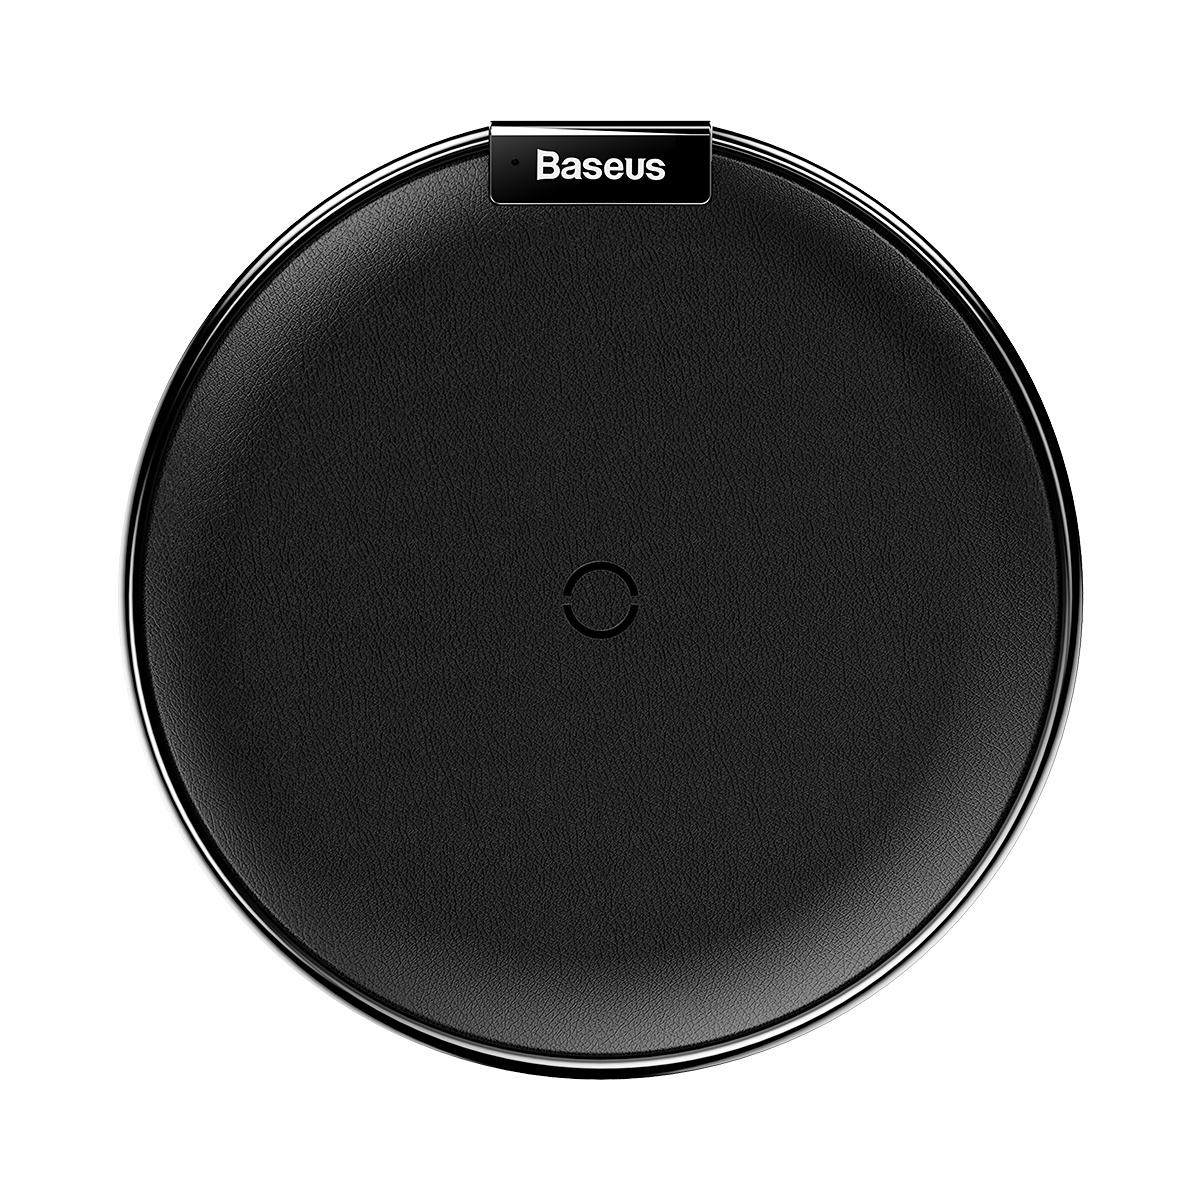 Baseus iX Desktop Wireless Charger Black